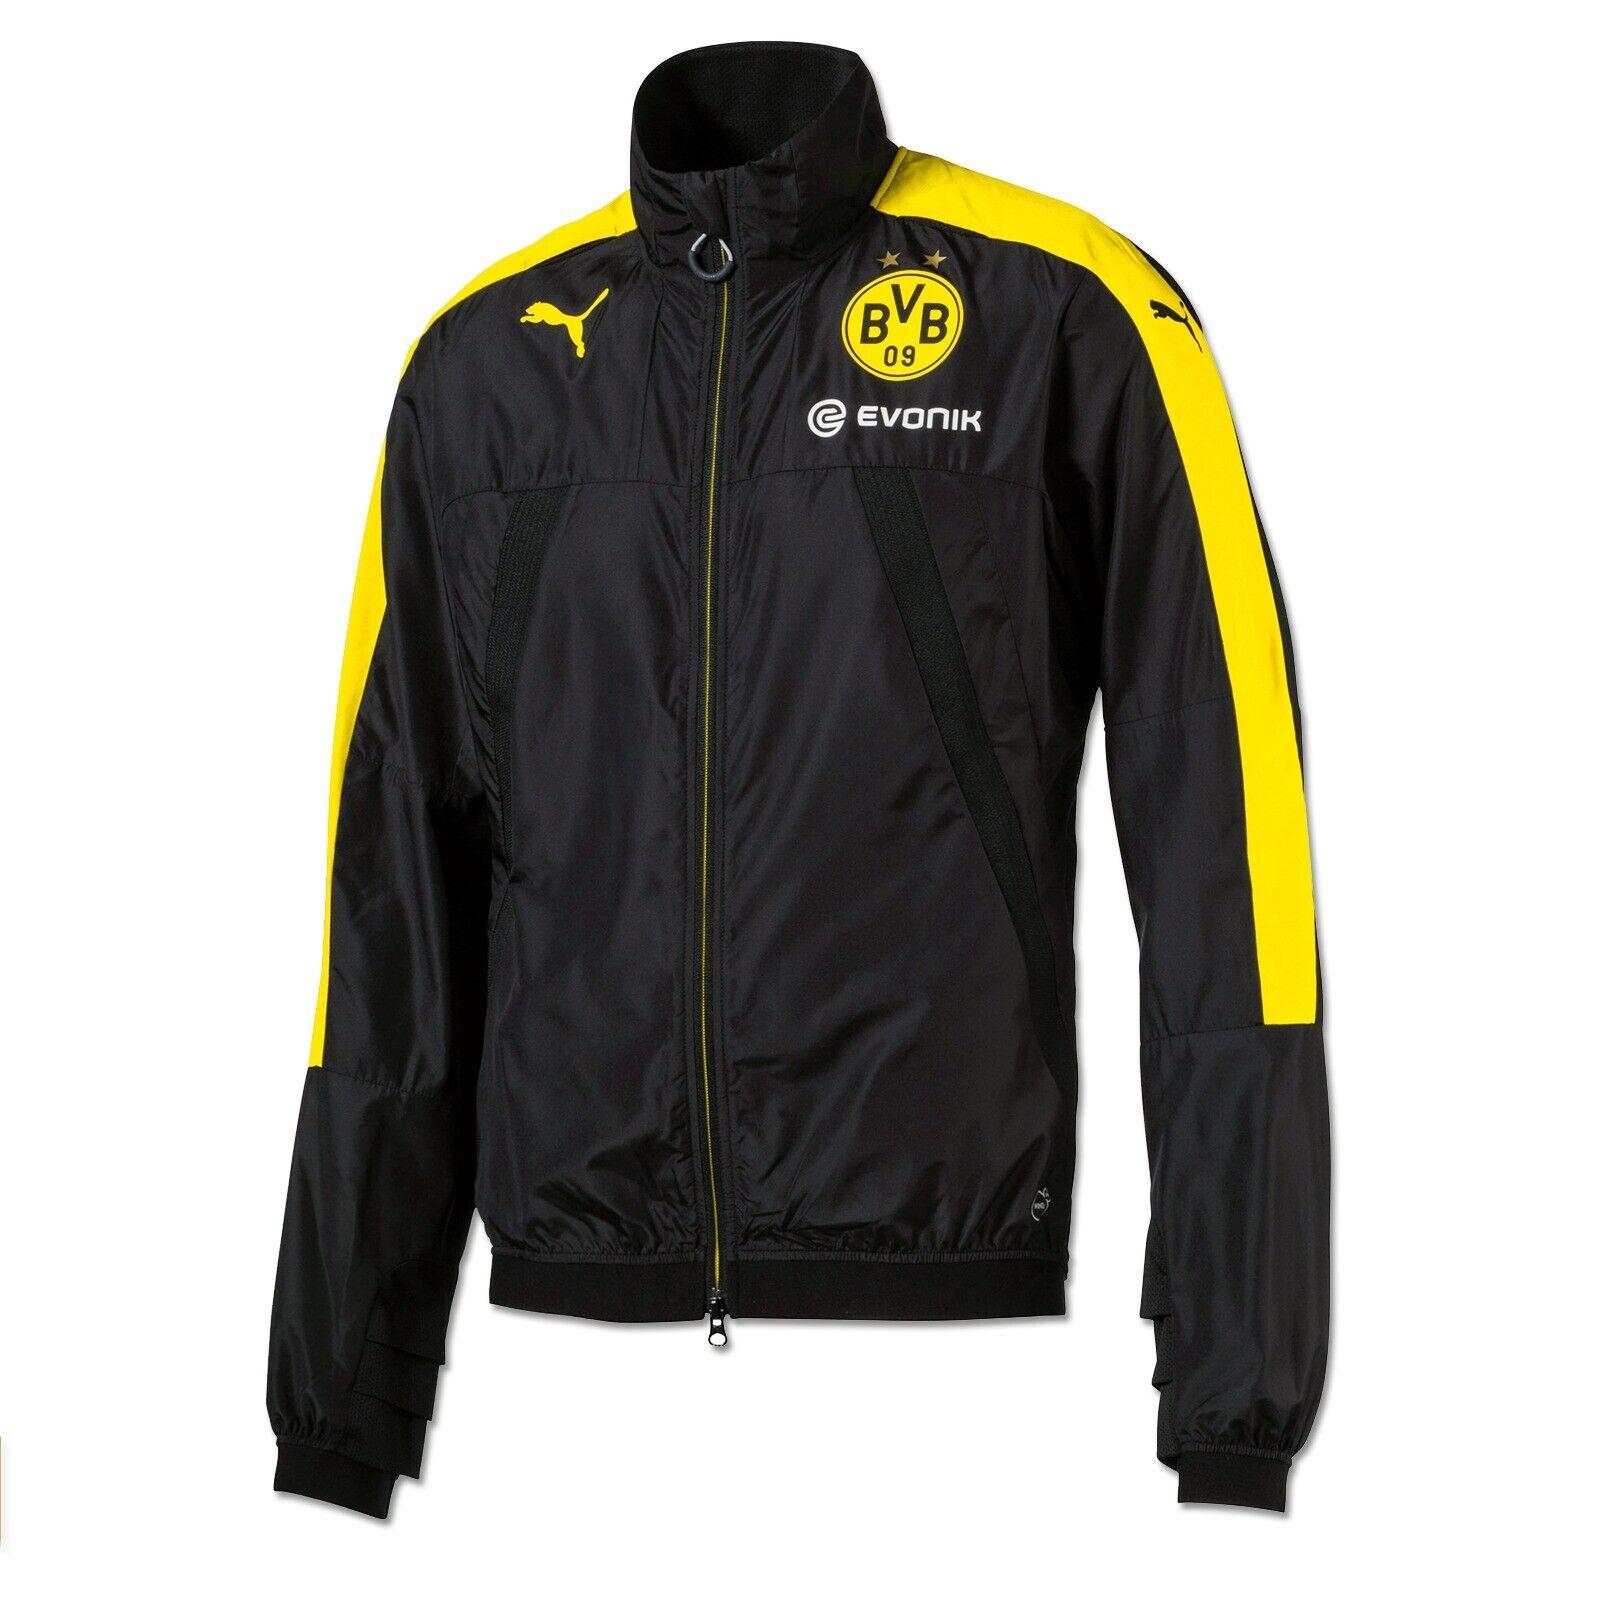 BVB-Trainingsjacke (schwarzgelb) Schwarz Borussia Dortmund